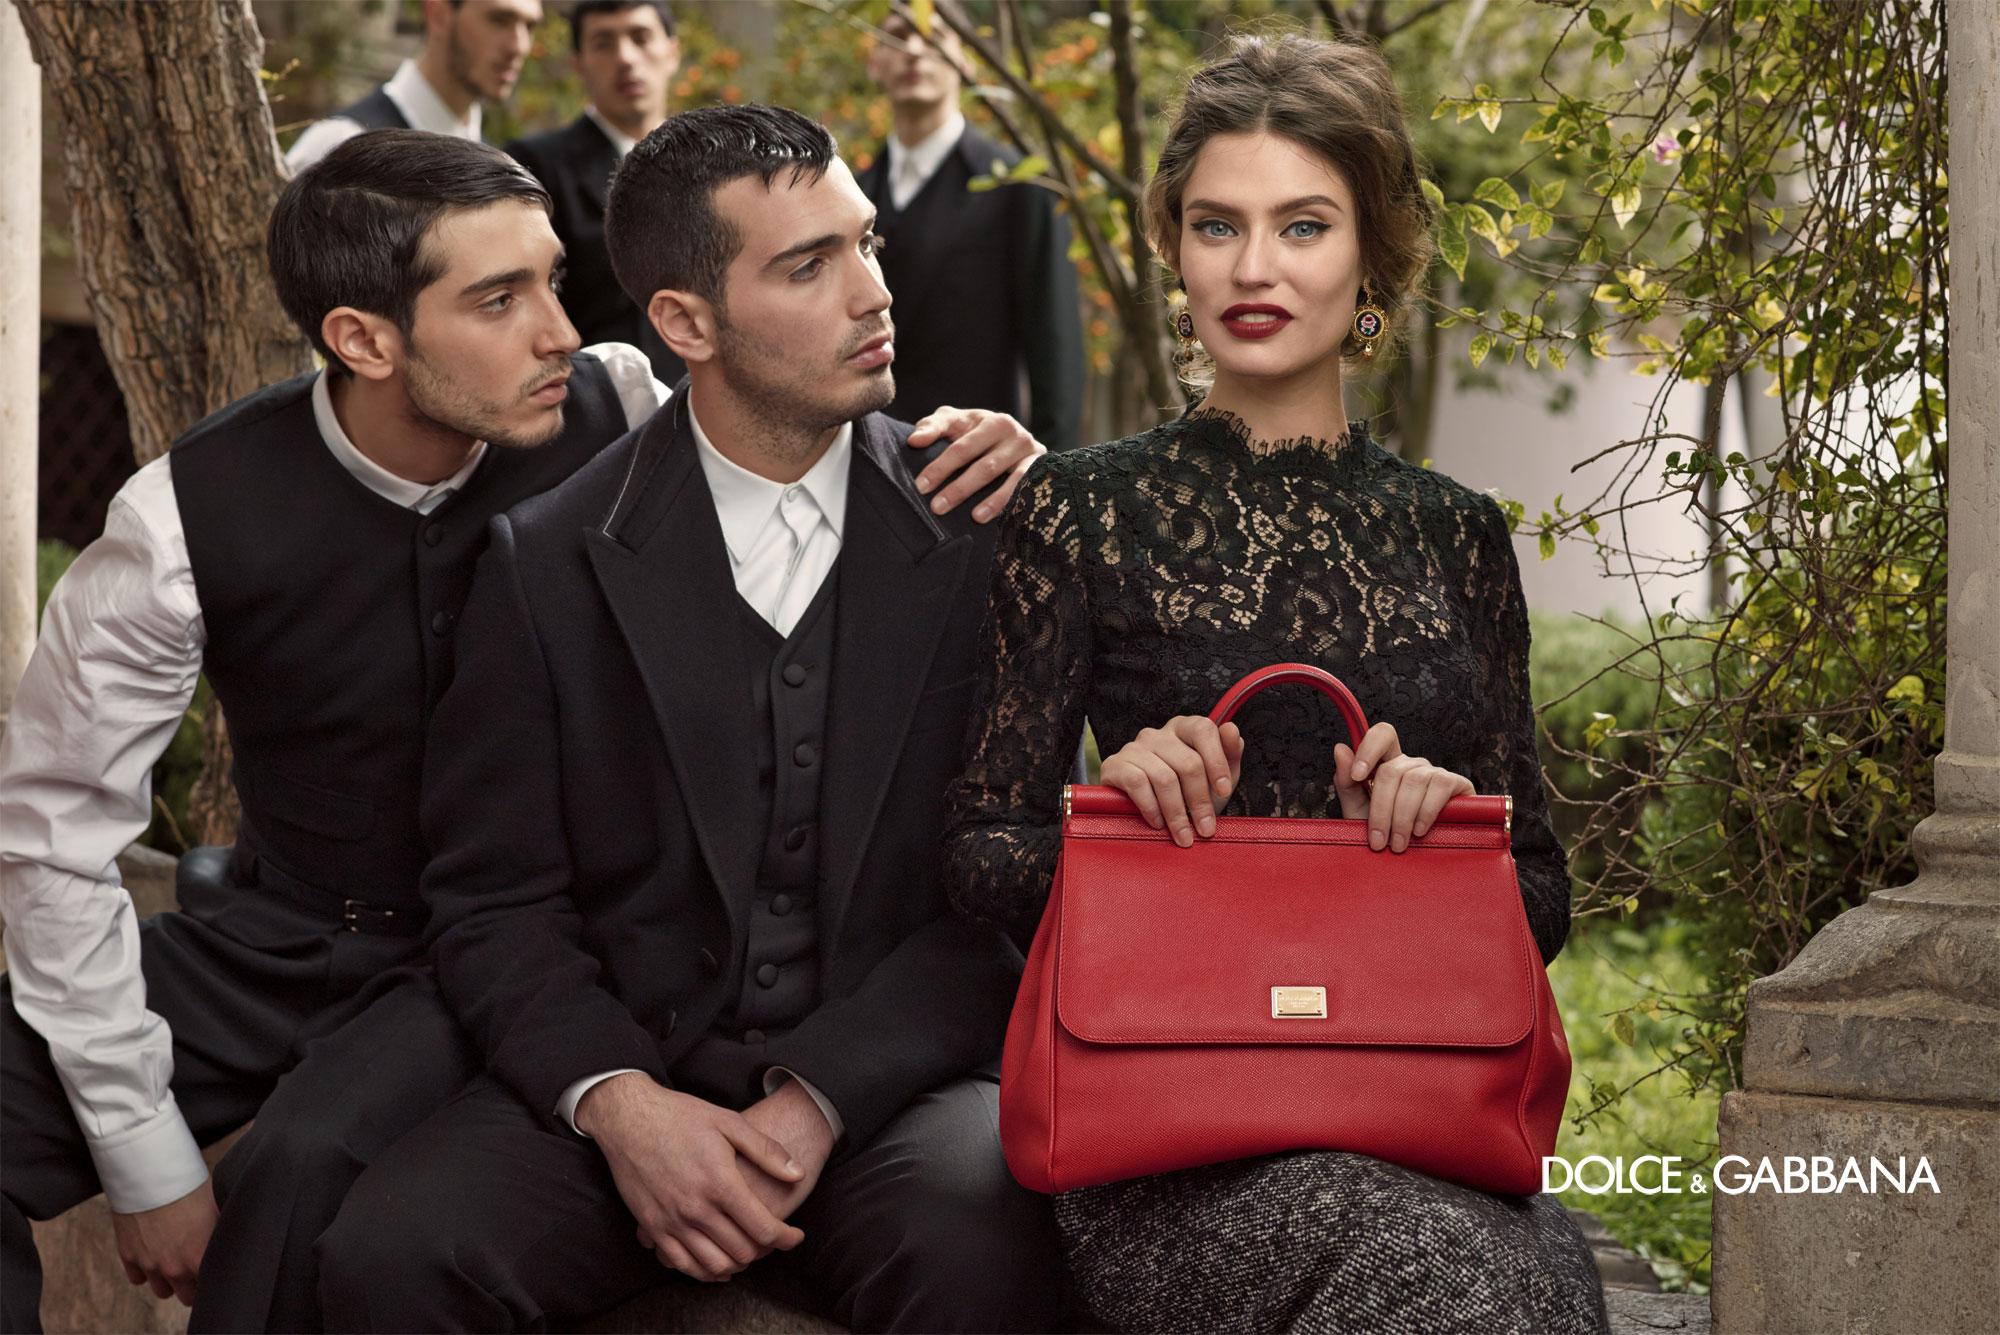 dolce-and-gabbana-fw-2014-women-adv-campaign-16